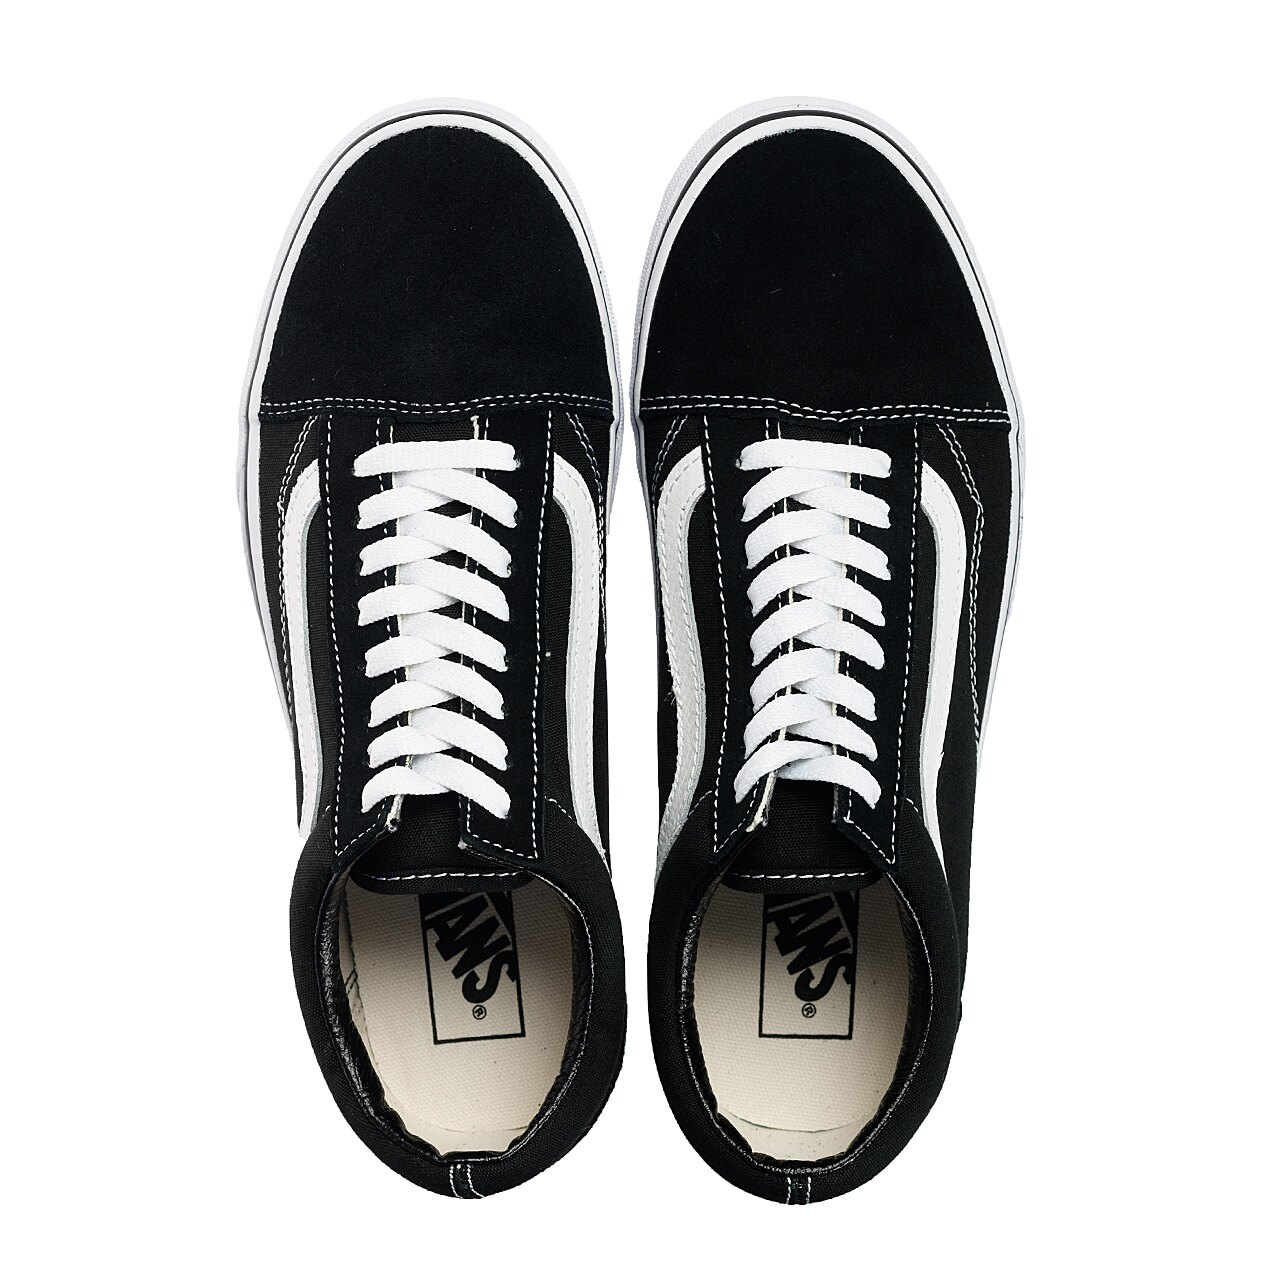 【VANS】Old Skool 基本款  黑 經典款 休閒鞋 男女 專櫃價2380  VN000D3HY28(palace store) 5